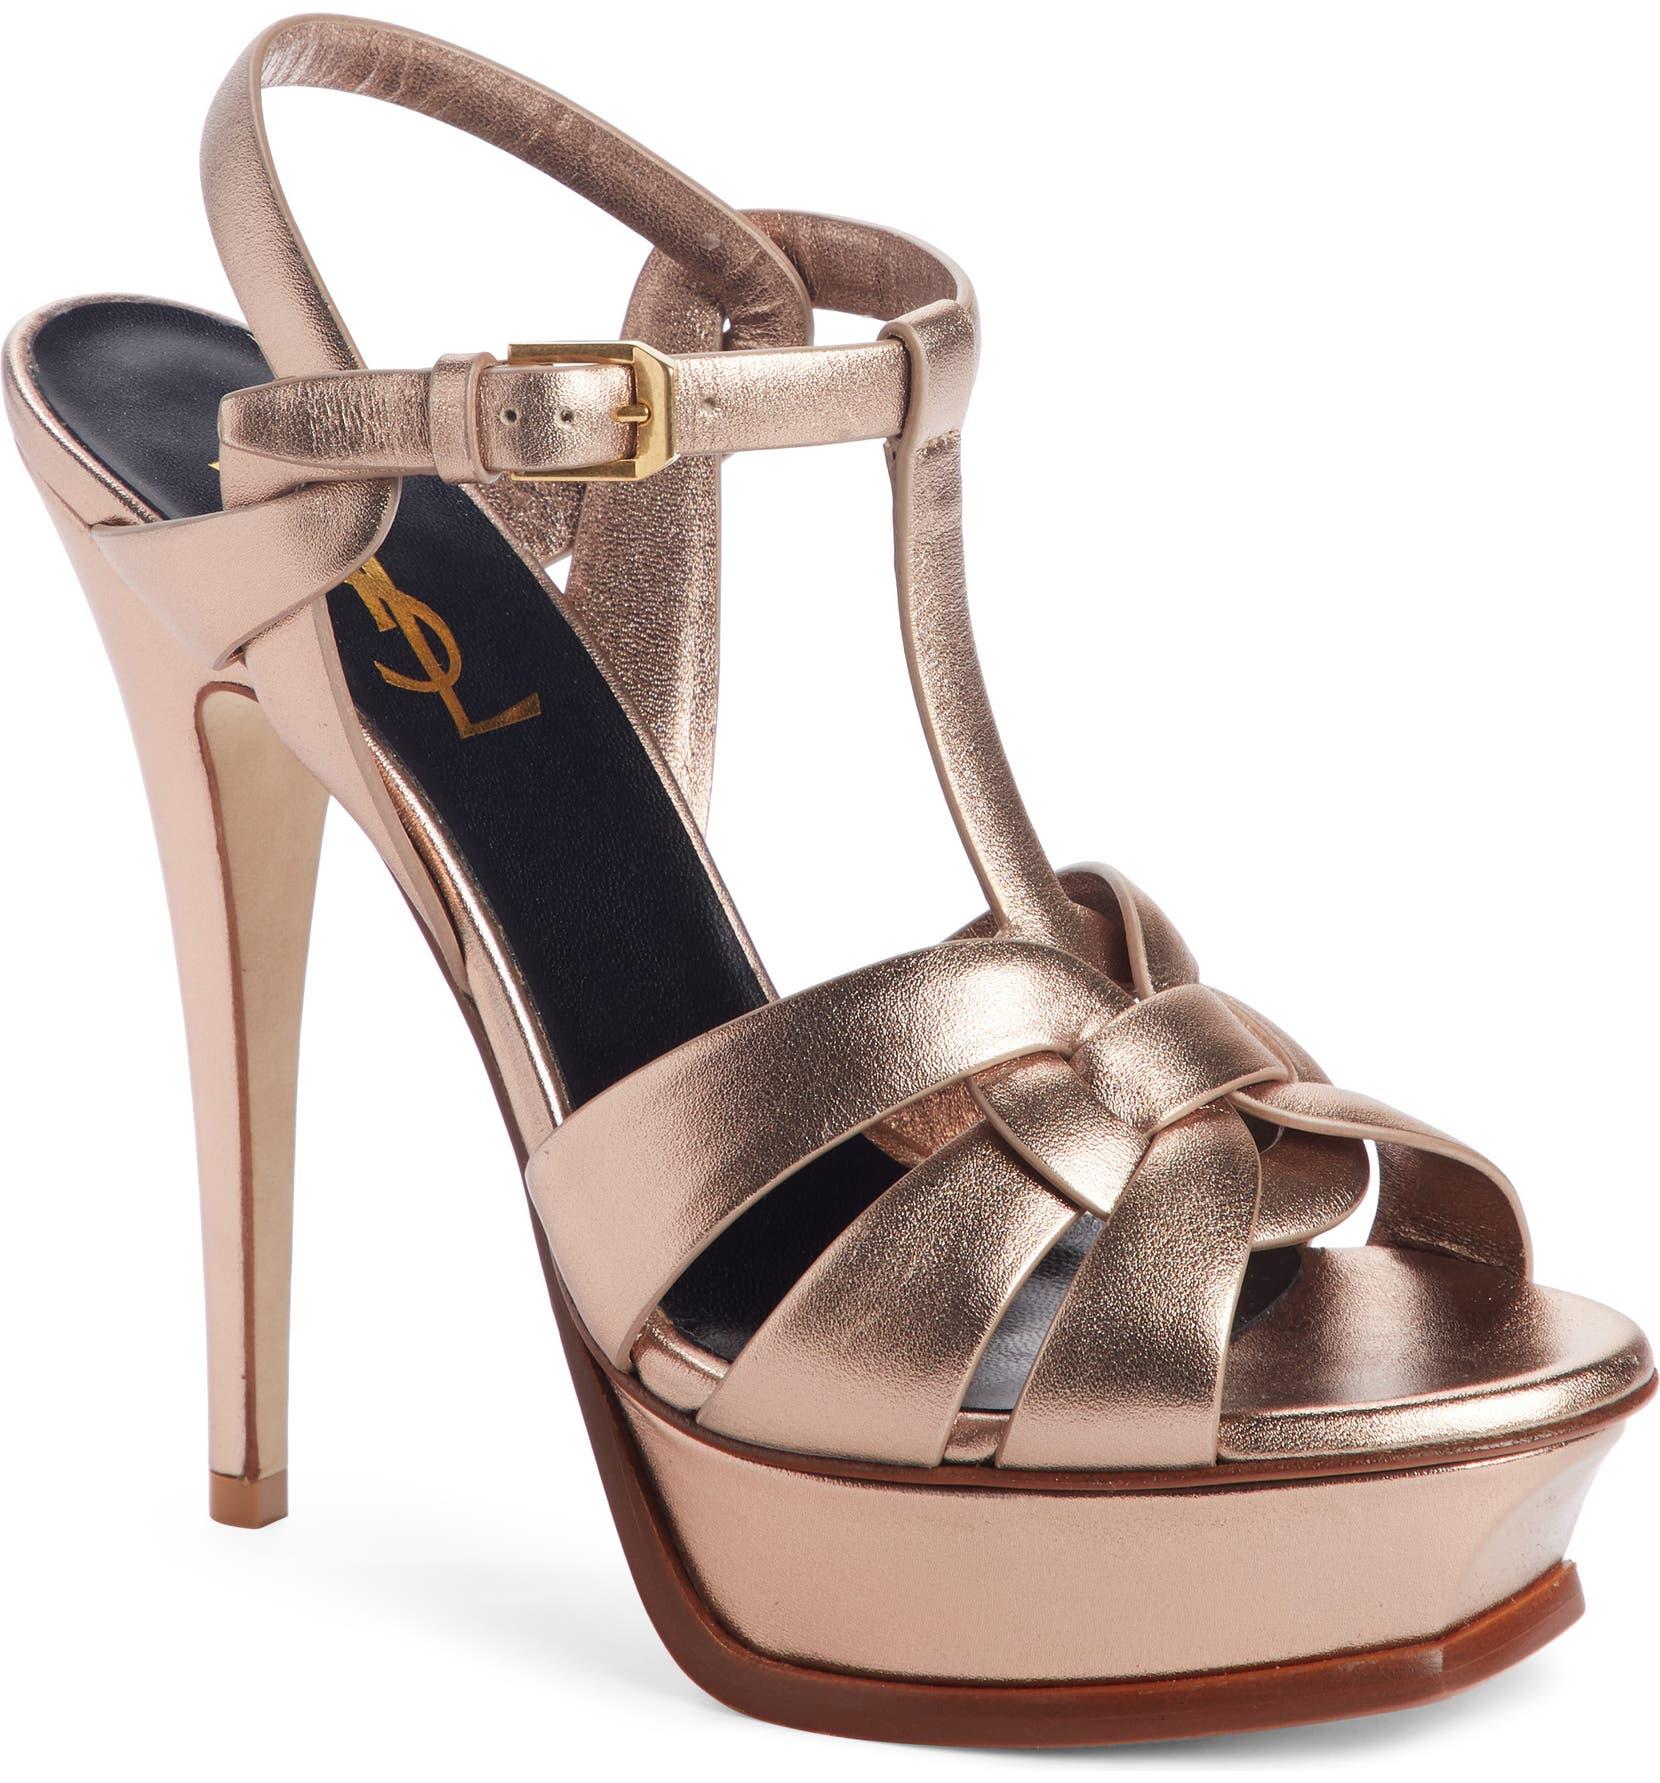 690e5f01f9f0ca Saint Laurent Tribute Metallic Platform Sandal (Women)